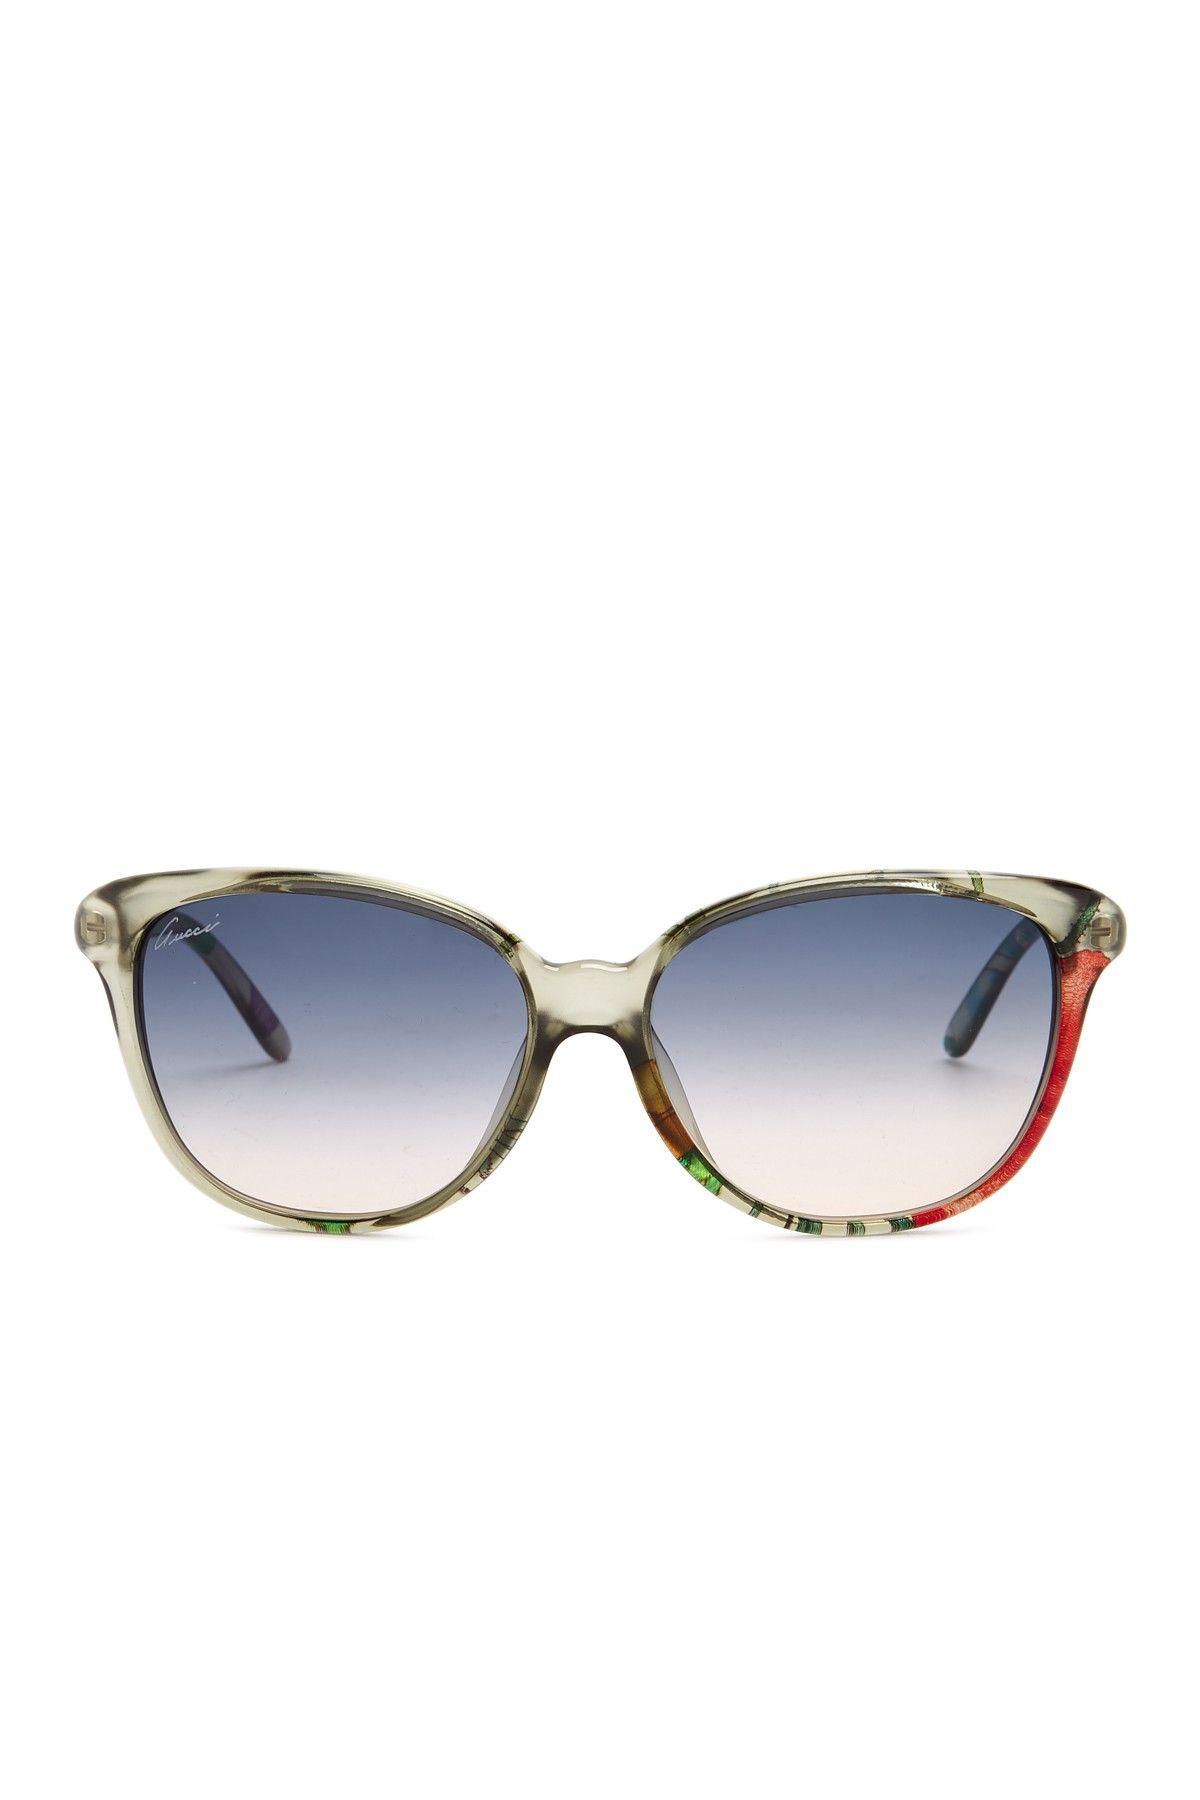 ed770d92f9 Women s Cat Eye 57mm Acetate Frame Sunglasses by GUCCI on  HauteLook ...